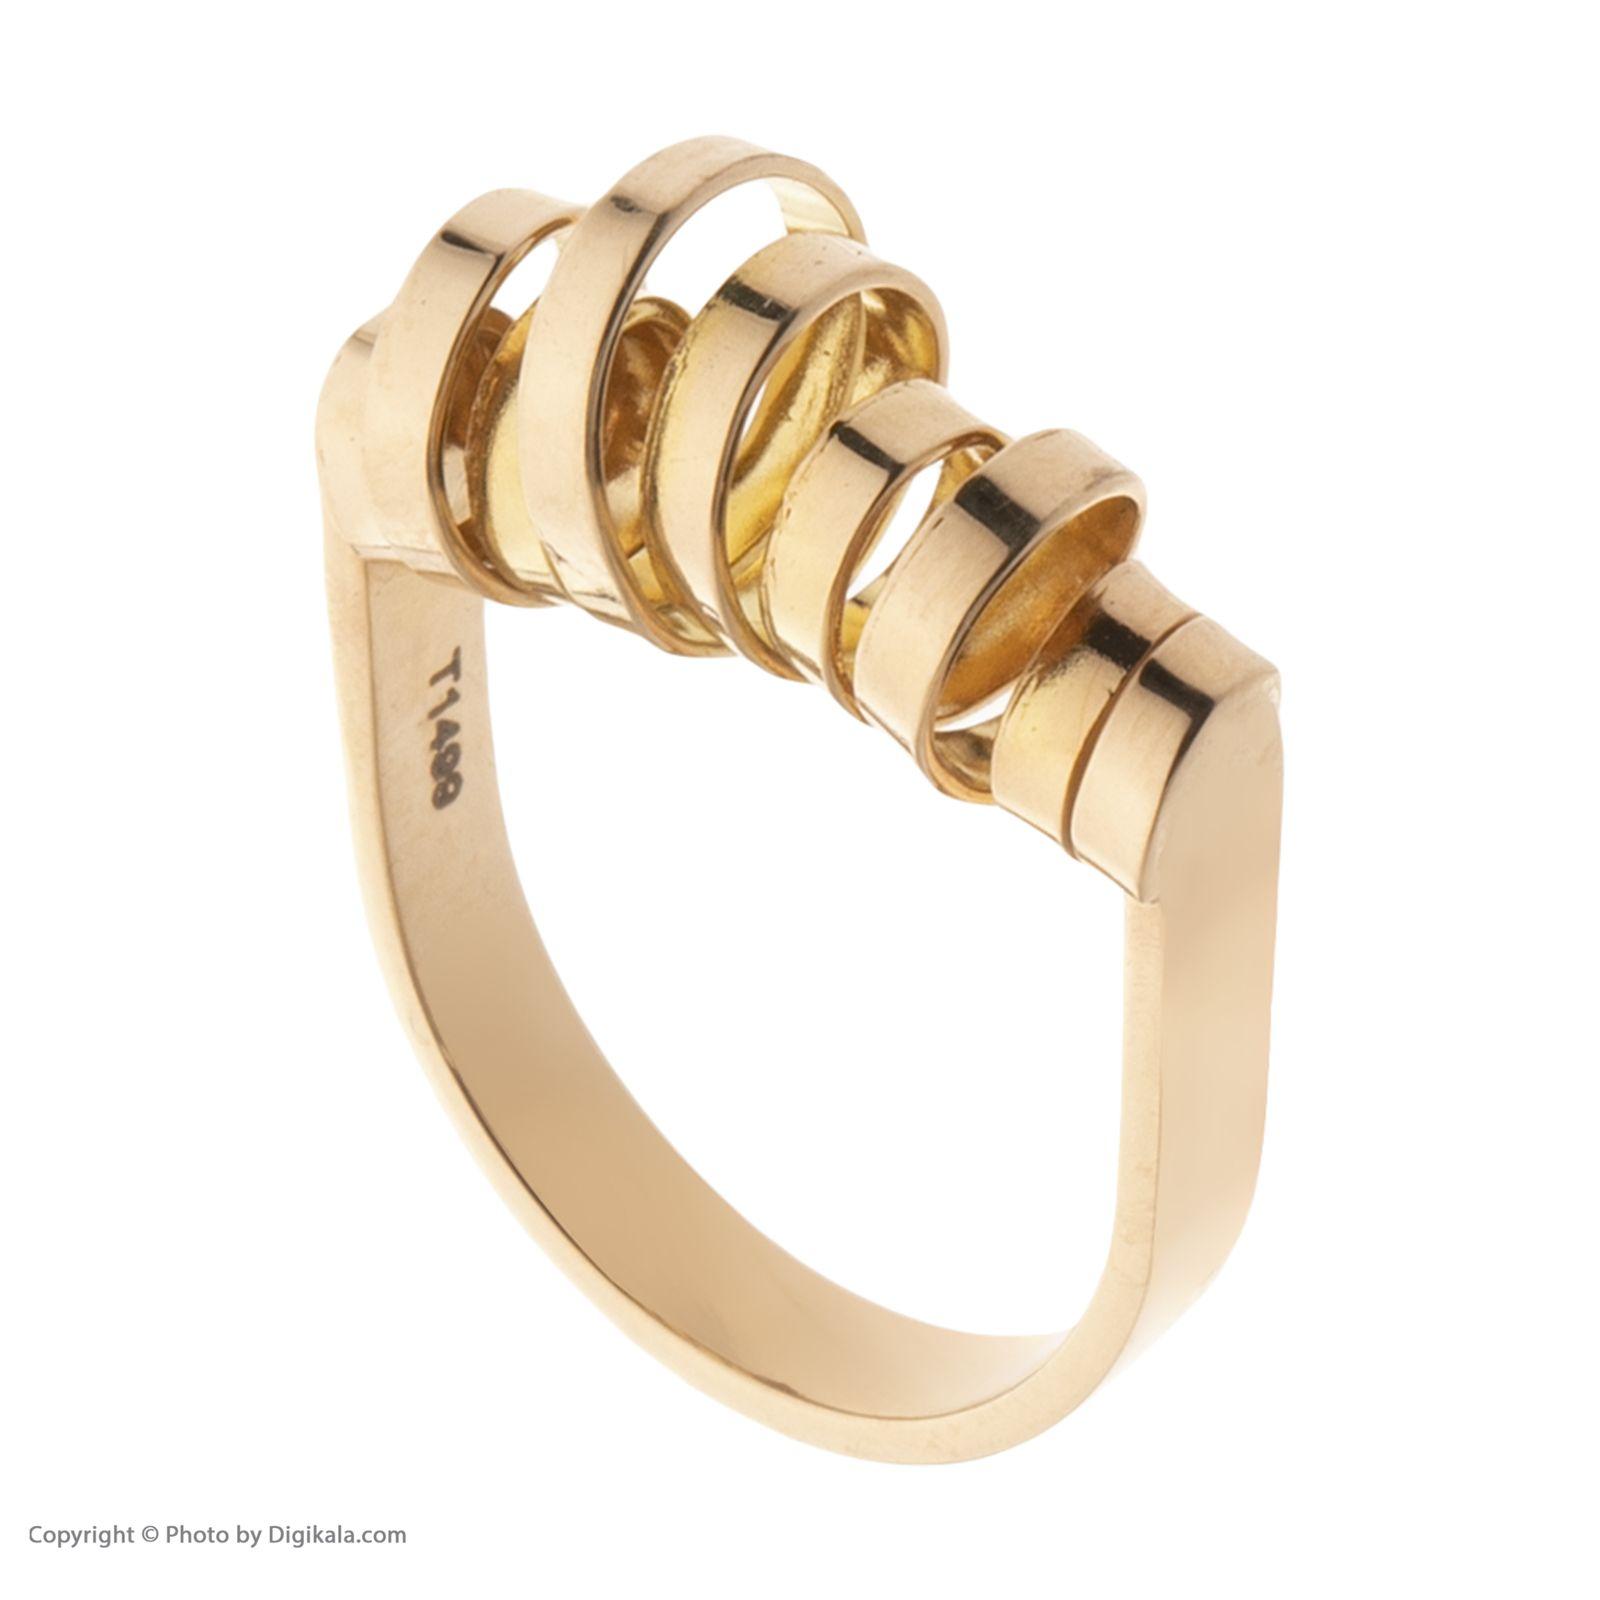 انگشتر طلا 18 عیار زنانه سنجاق مدل X068337 -  - 4